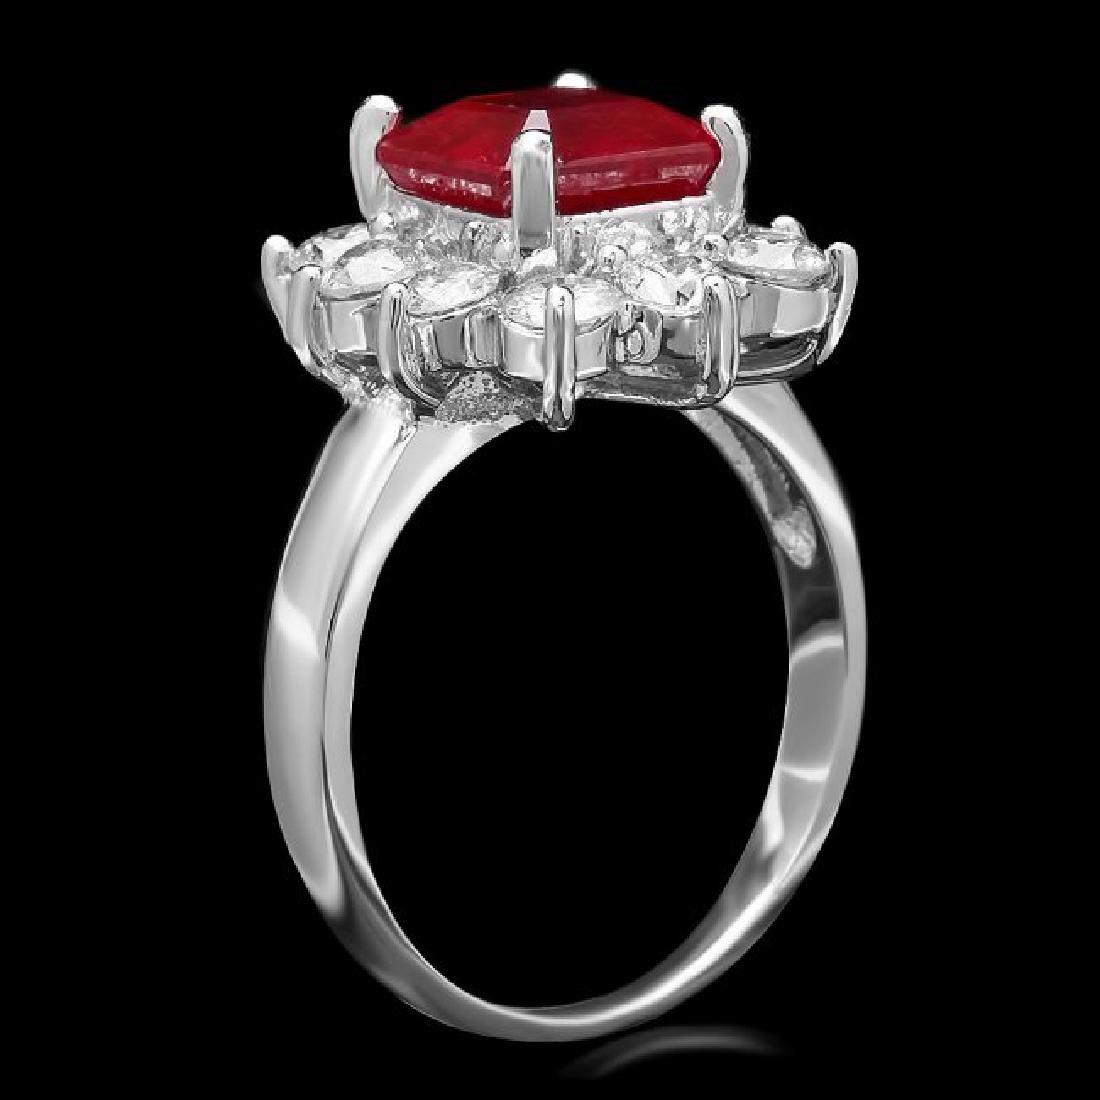 14k White Gold 3.40ct Ruby 1.25ct Diamond Ring - 2